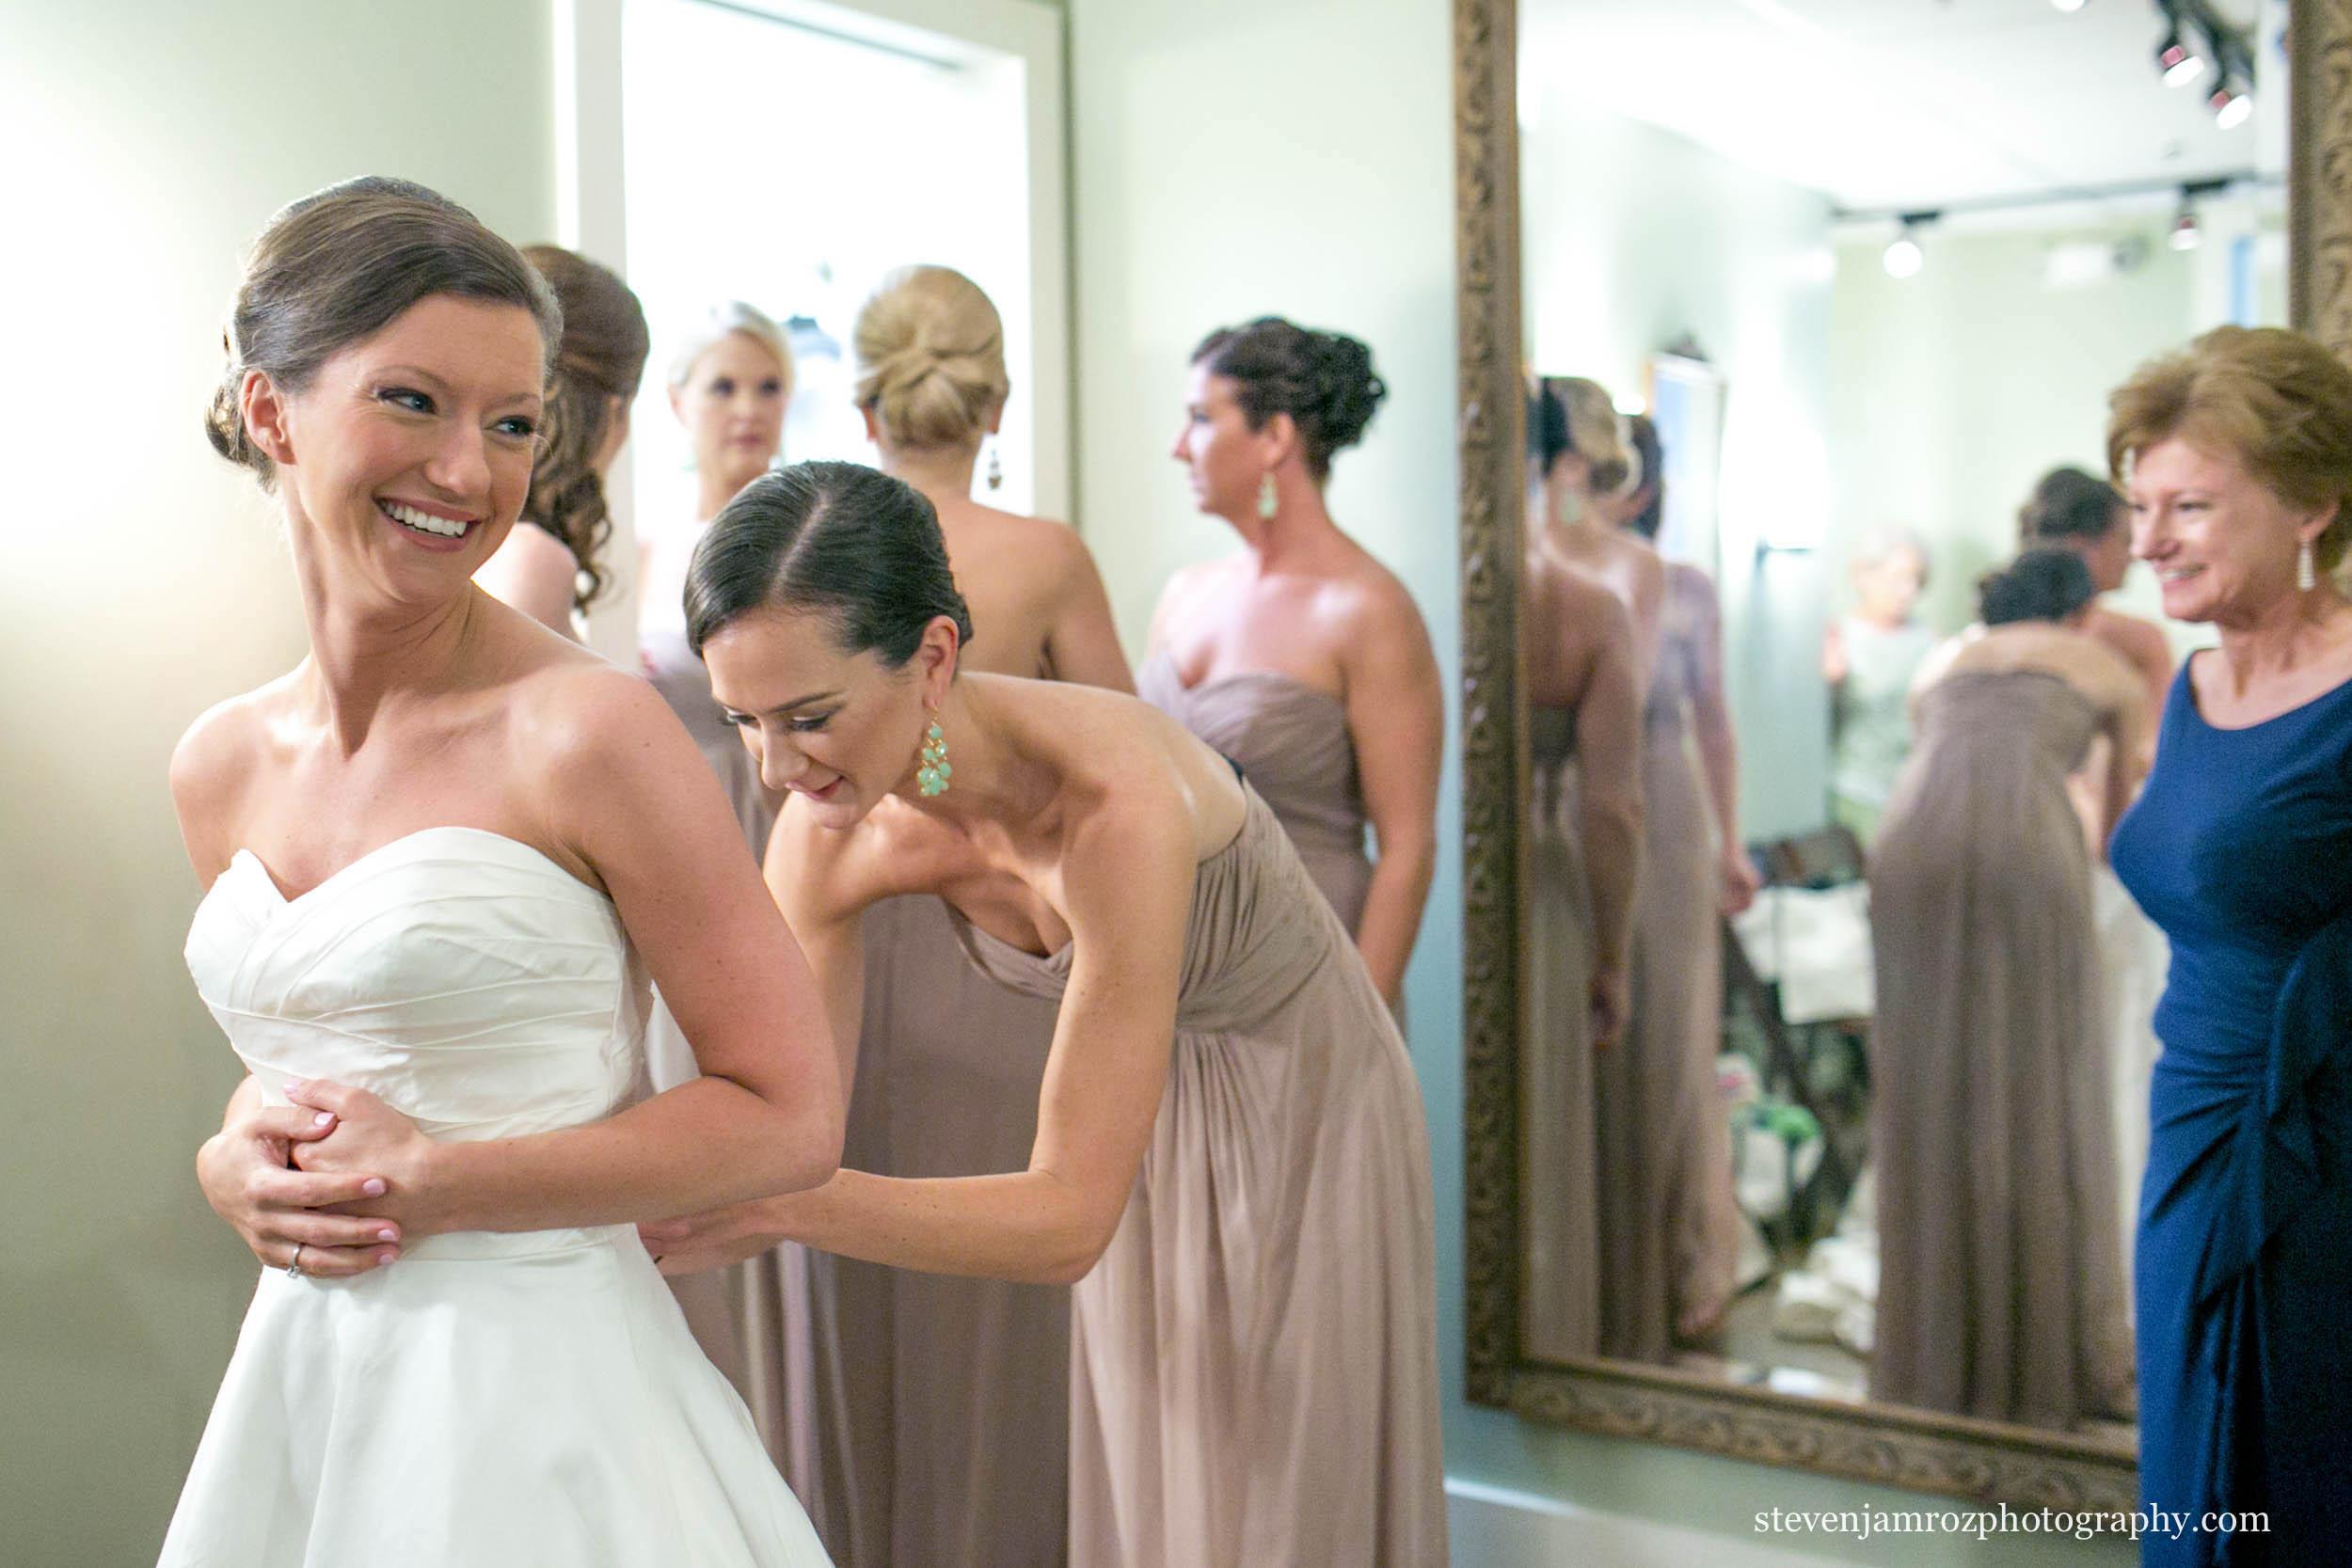 all-saints-church-wedding-girls-get-ready-steven-jamroz-0750.jpg